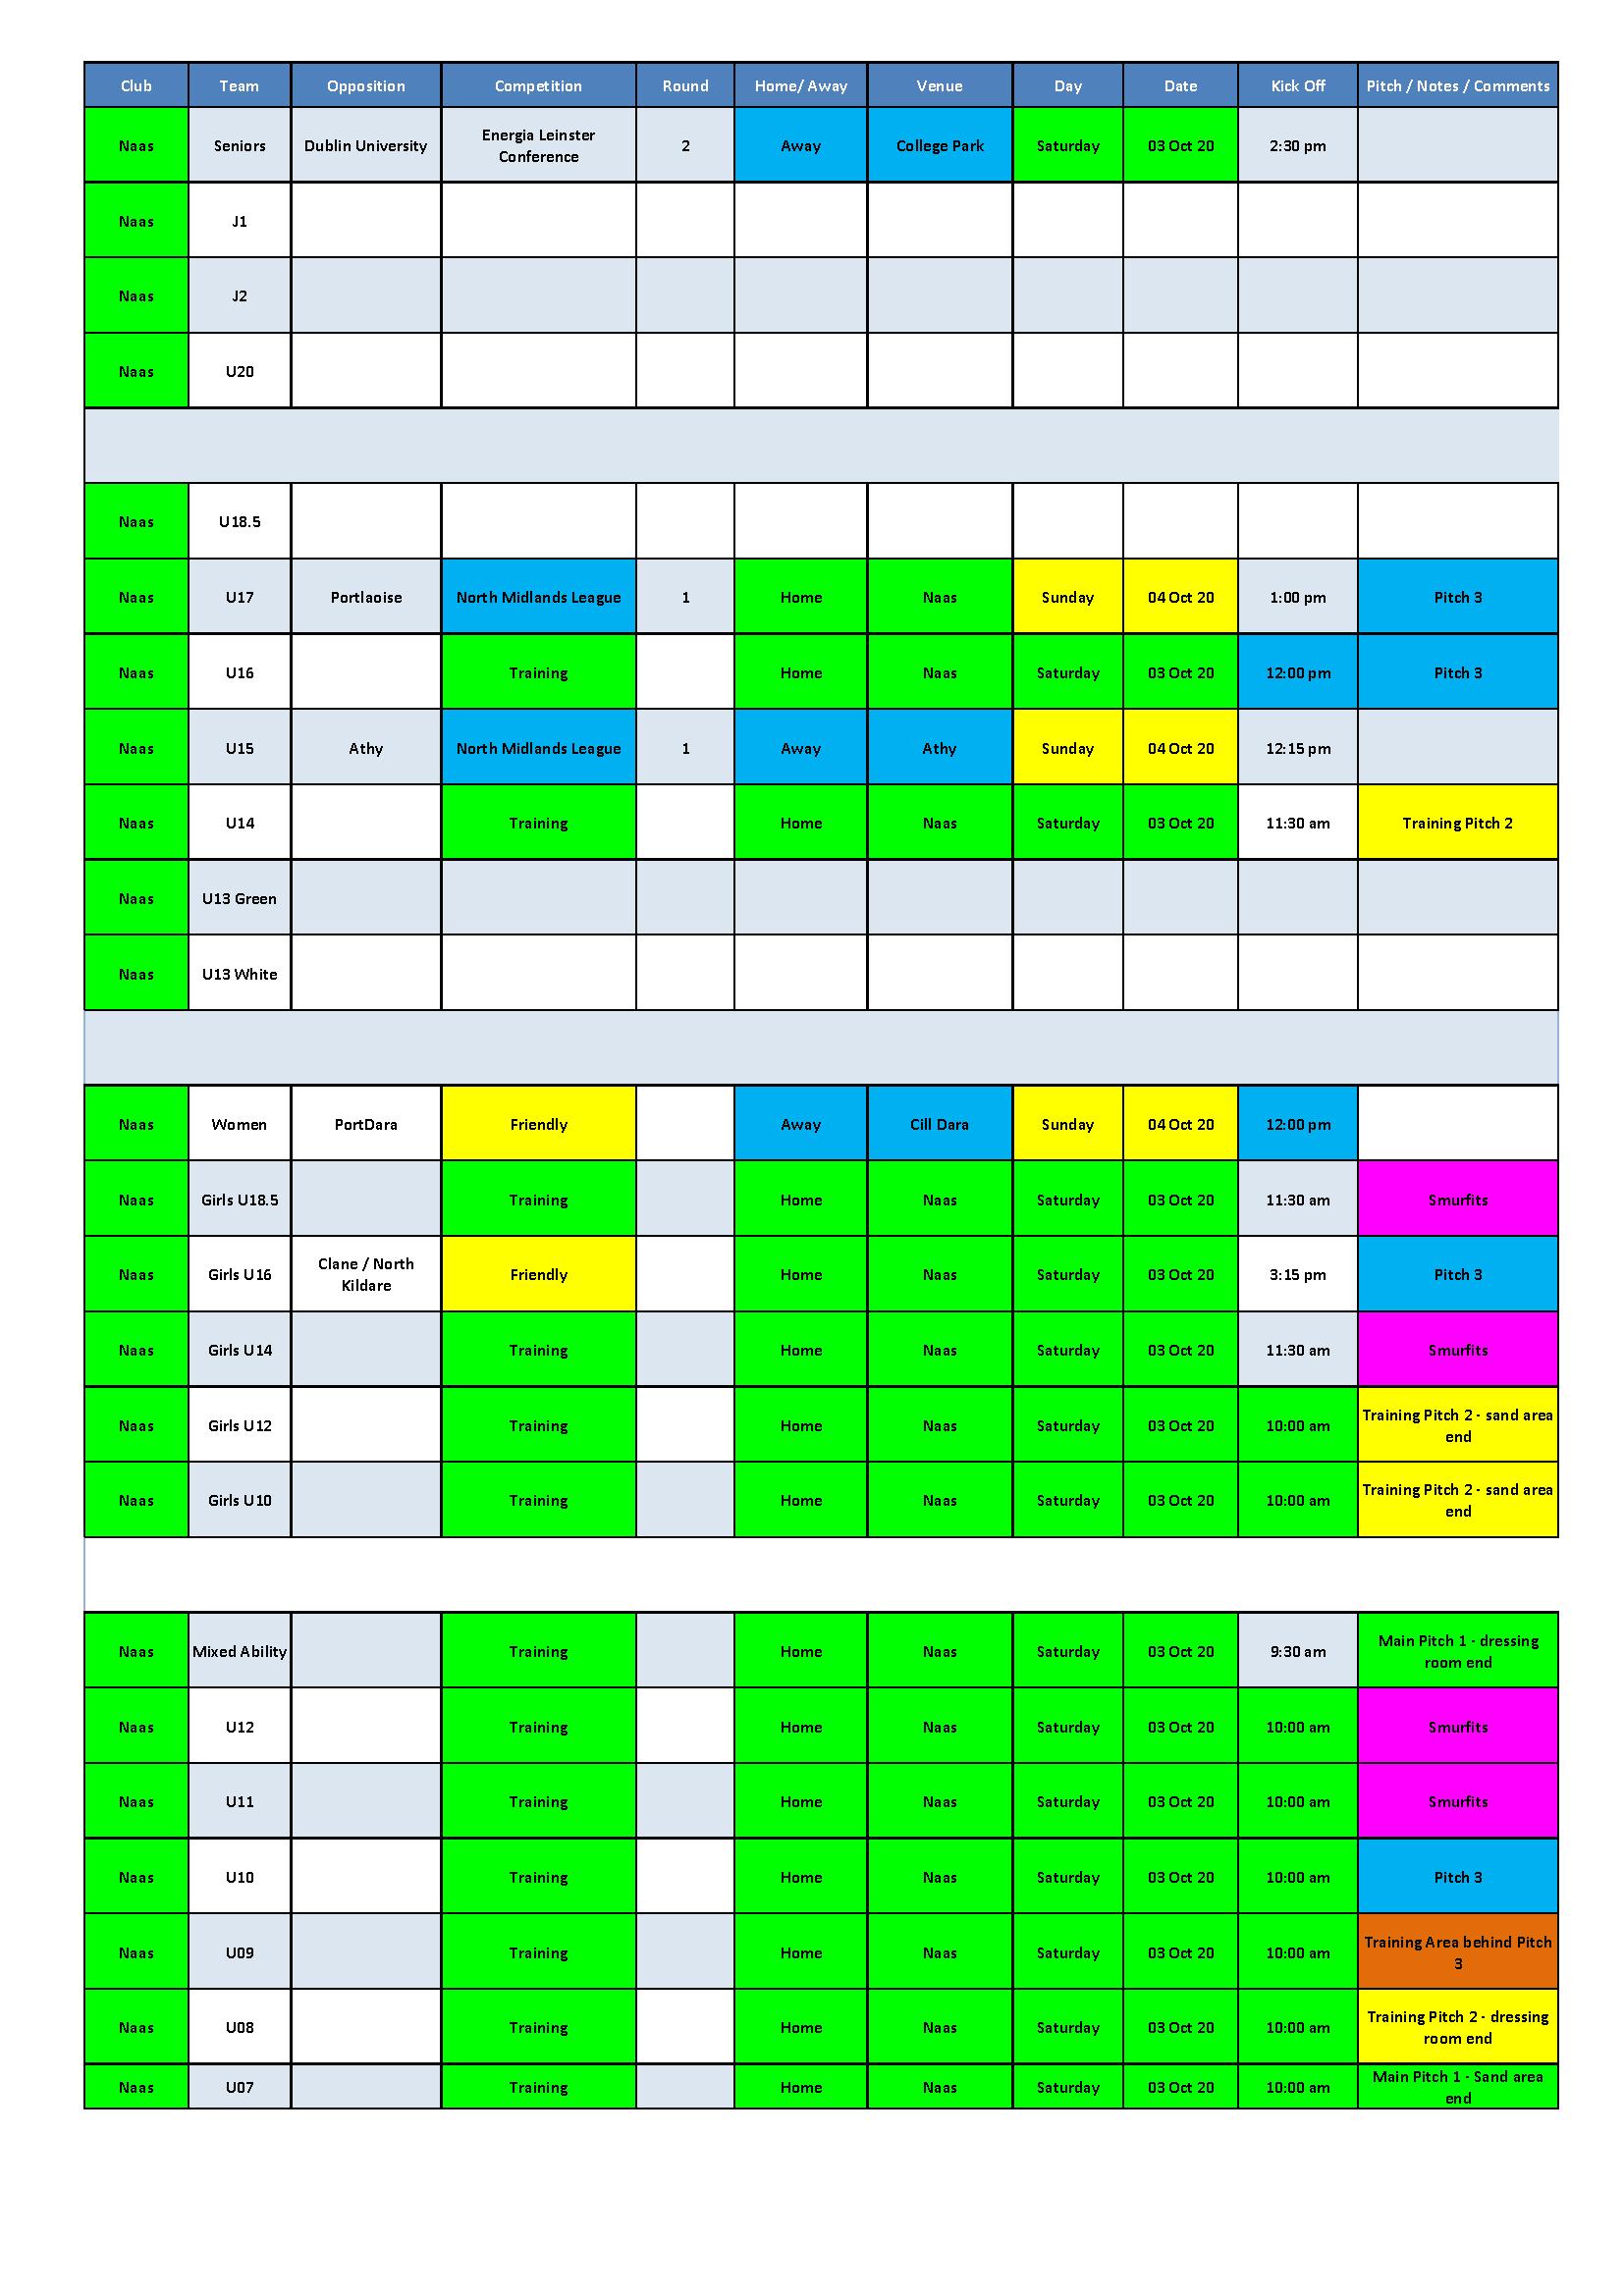 Naas 20rfc 20master 20fixtures 20w3 20final